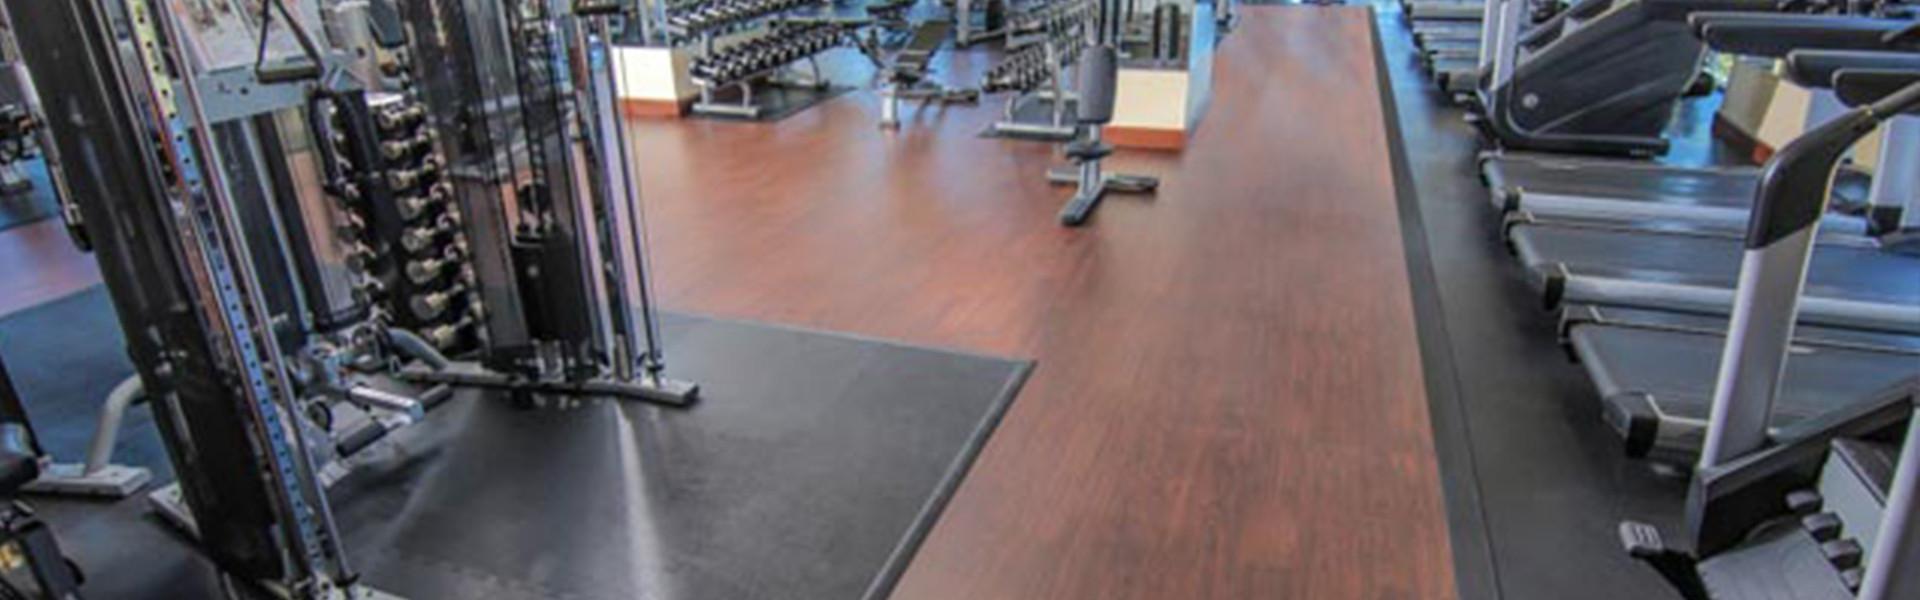 Westgate Gym Hours & Westgate Fitness Center | A resort Orlando fitness center | Fitness at Westgate Lakes Resort & Spa